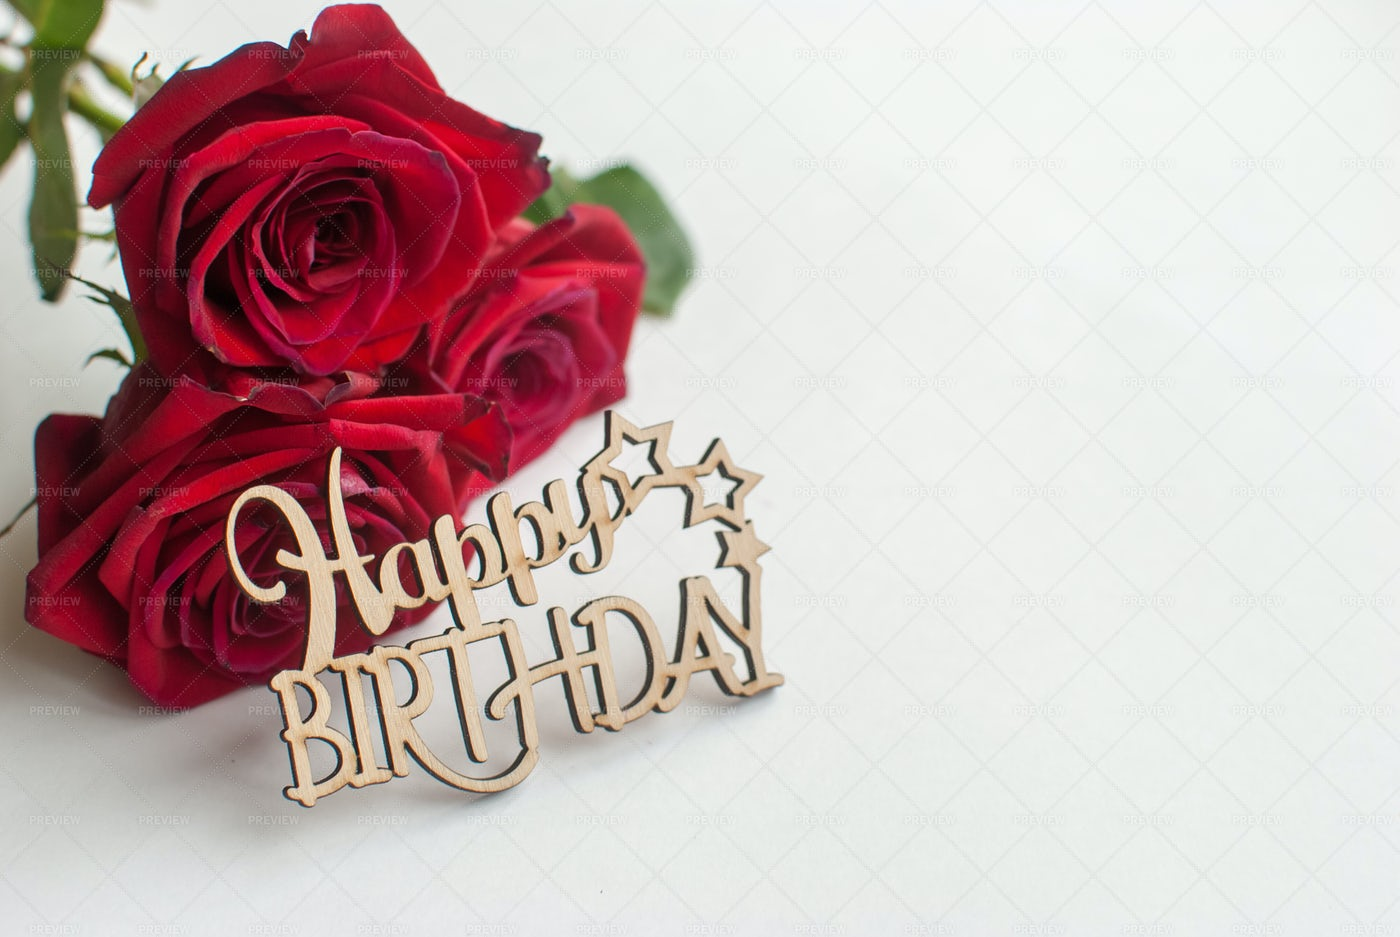 Happy Birthday And Roses: Stock Photos